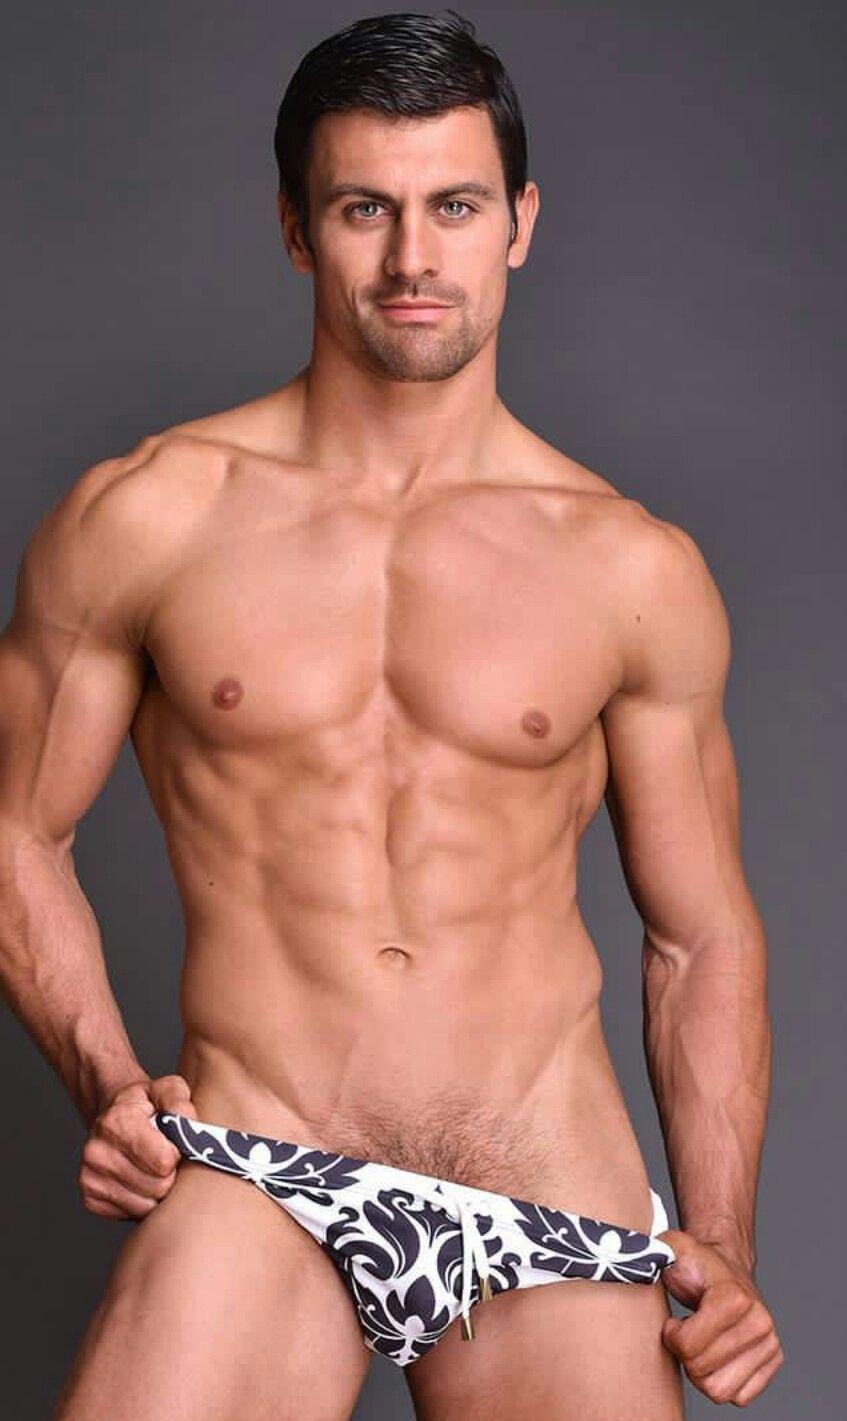 pinrandy ramirez on hotties in undies | pinterest | sexy men